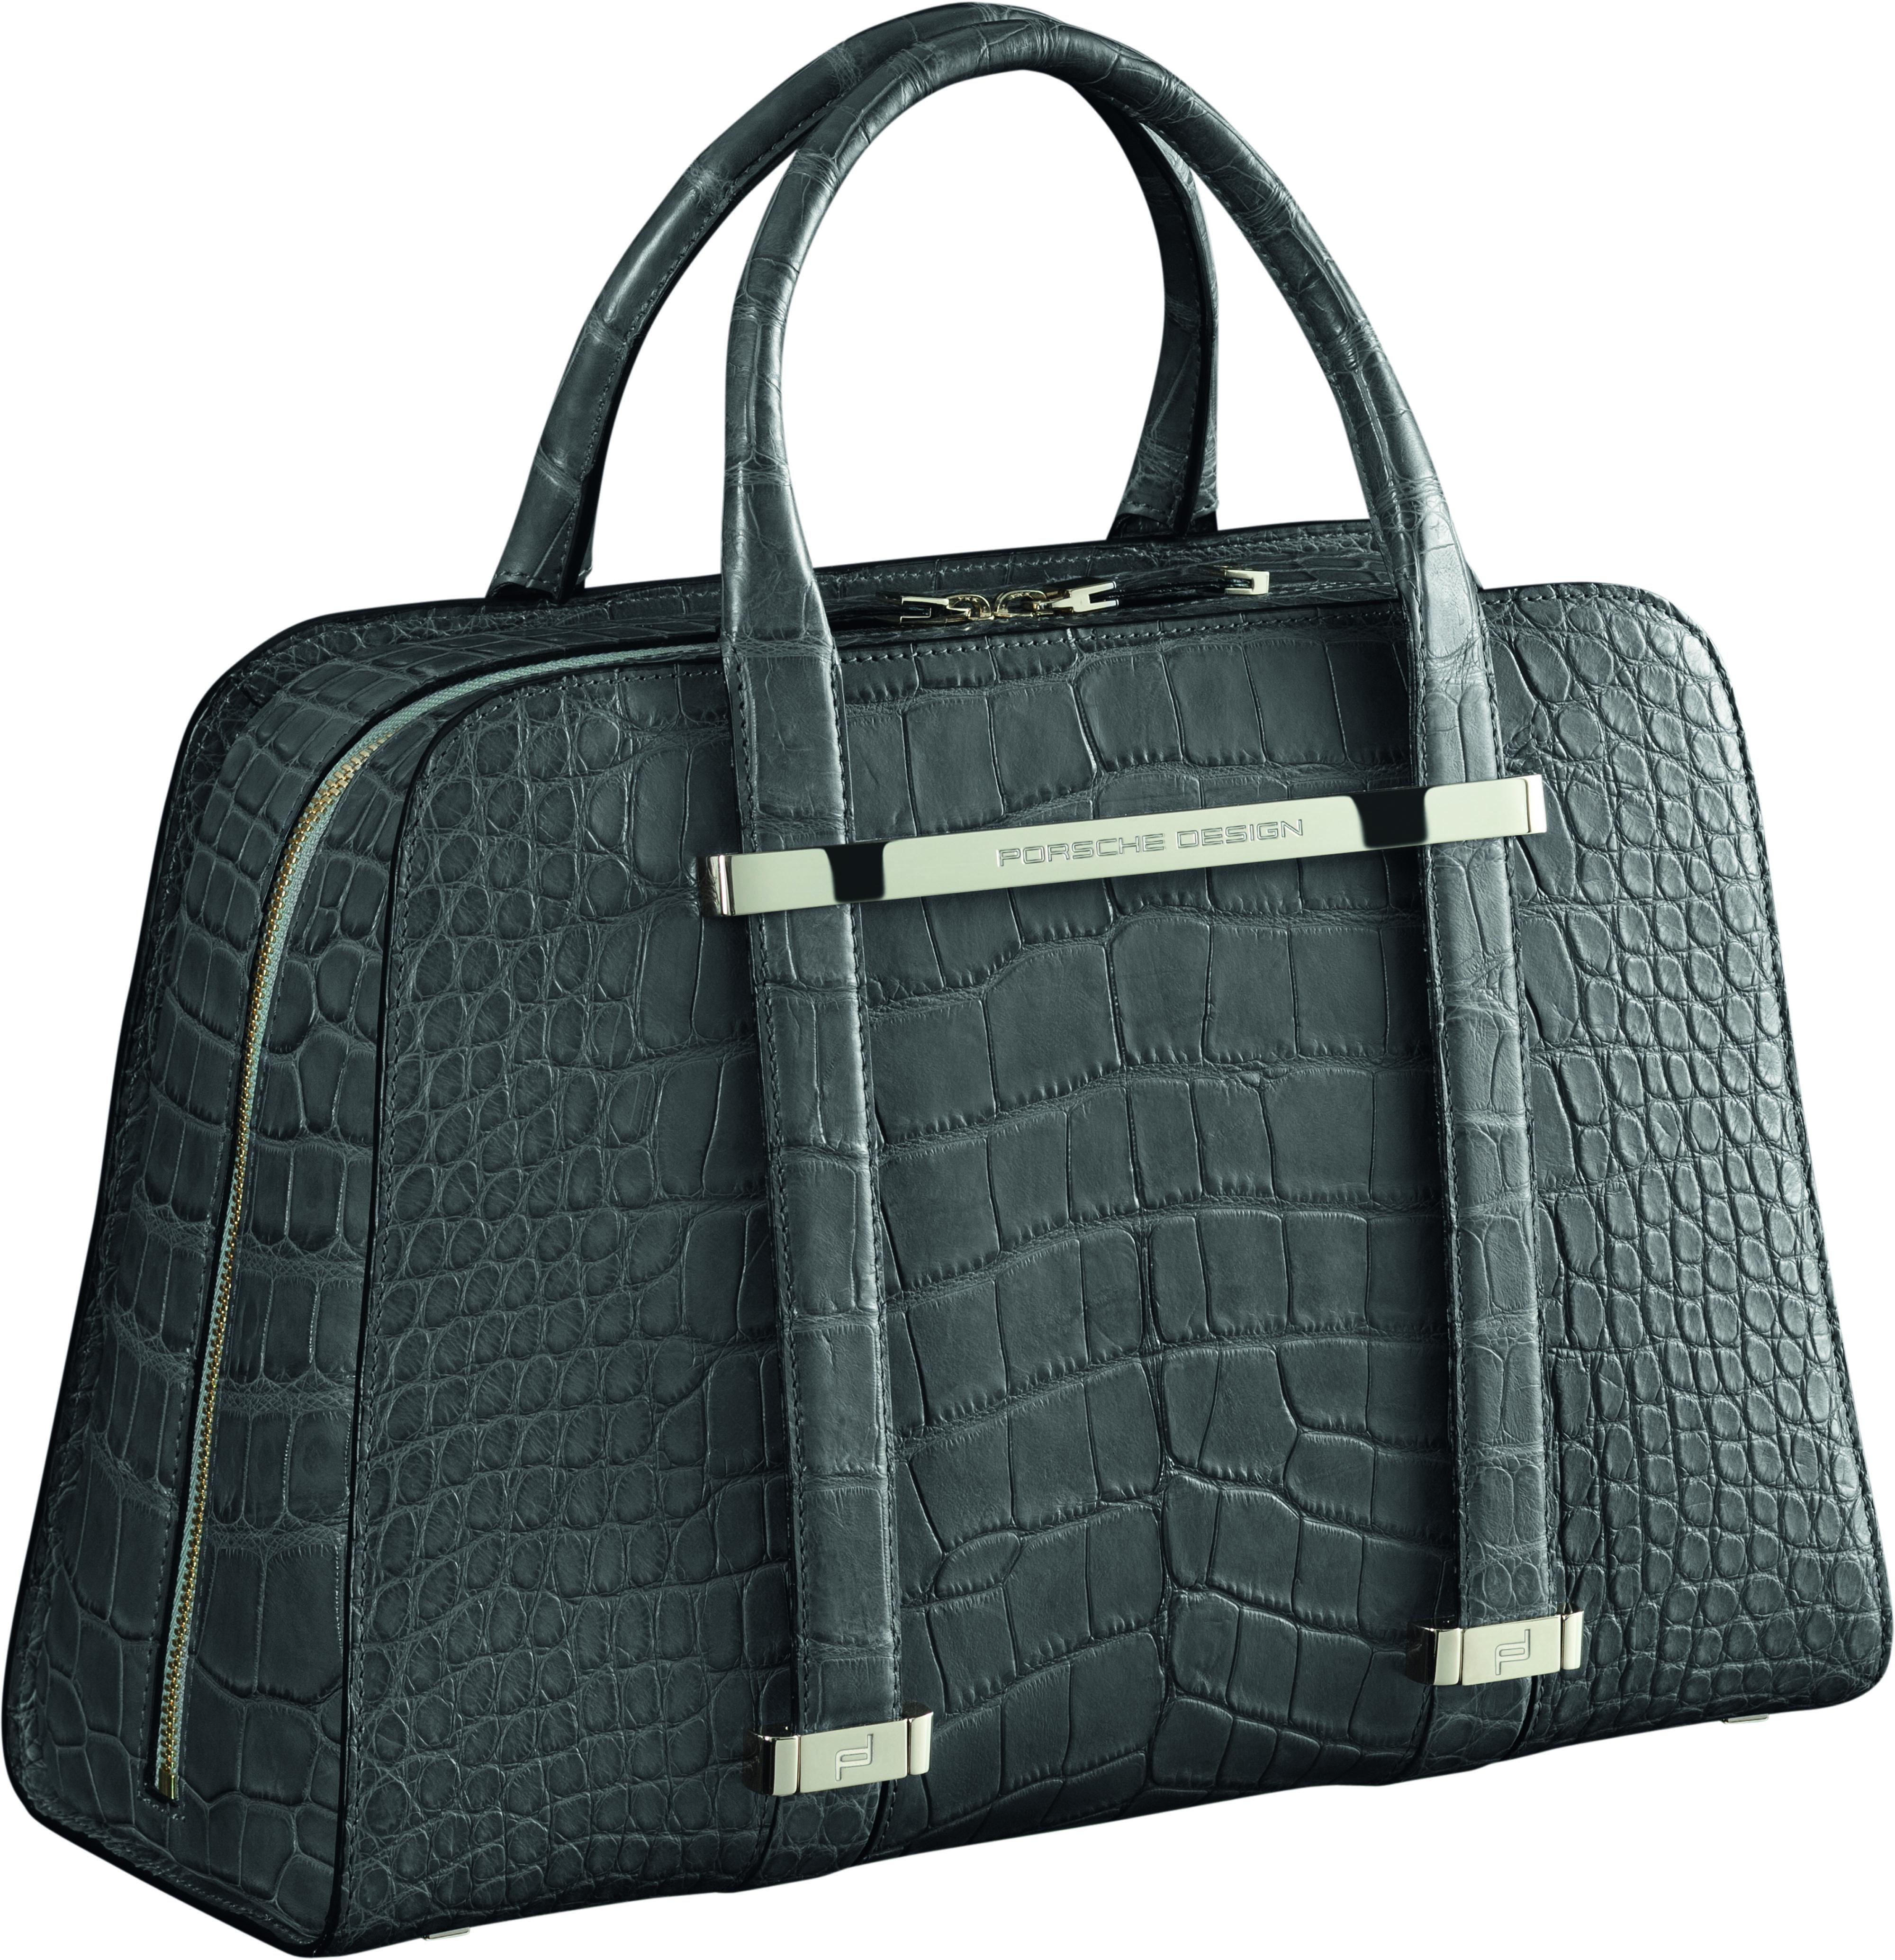 21cb5e12015 TwinBag in grey crocodile leather